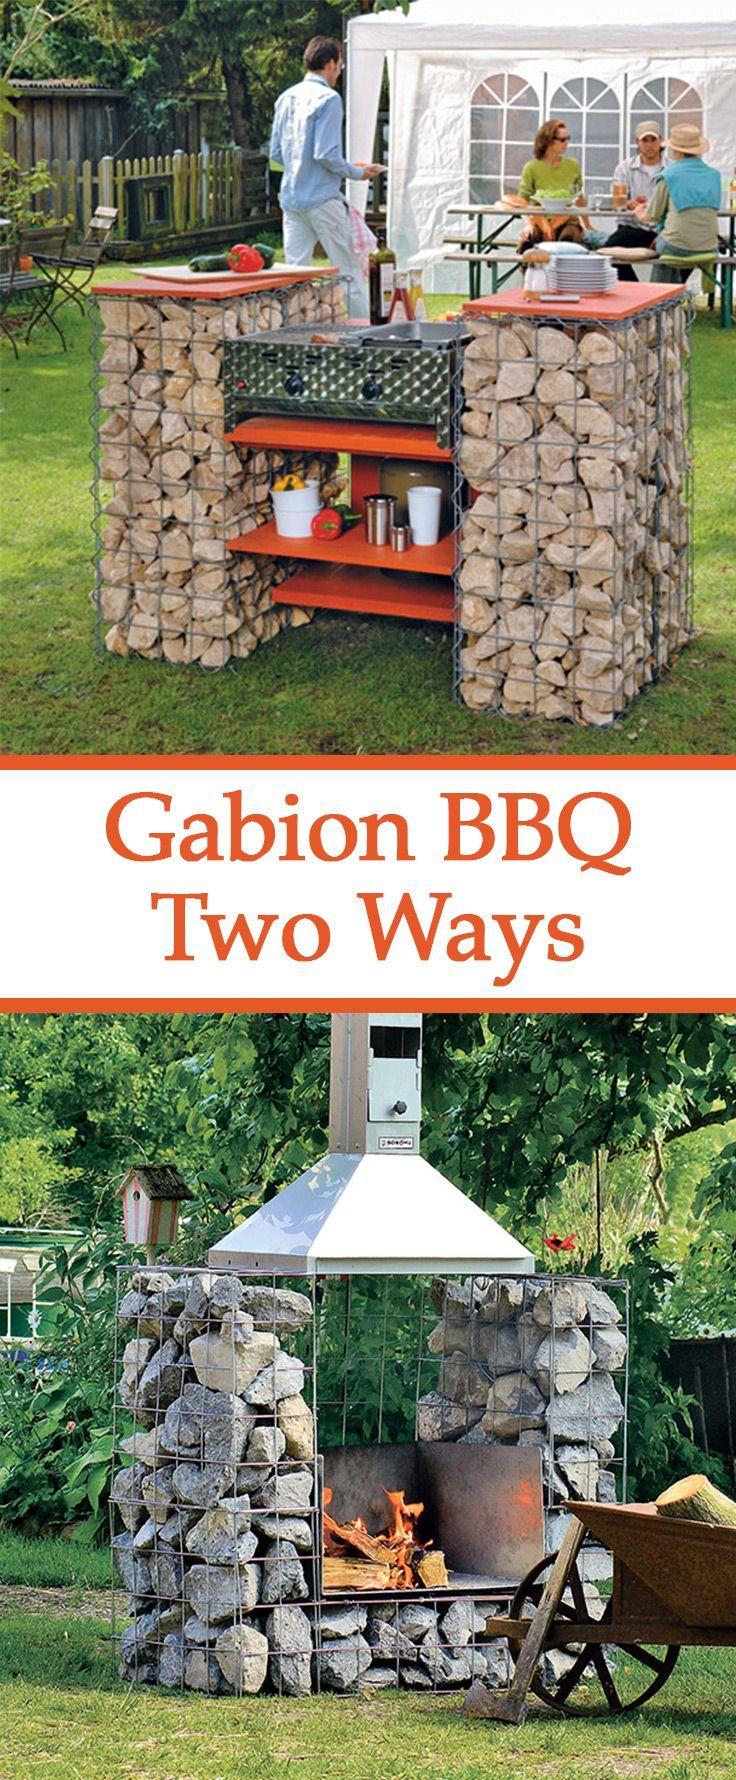 Grill bauen selbstde bbq island outdoor bbq diy